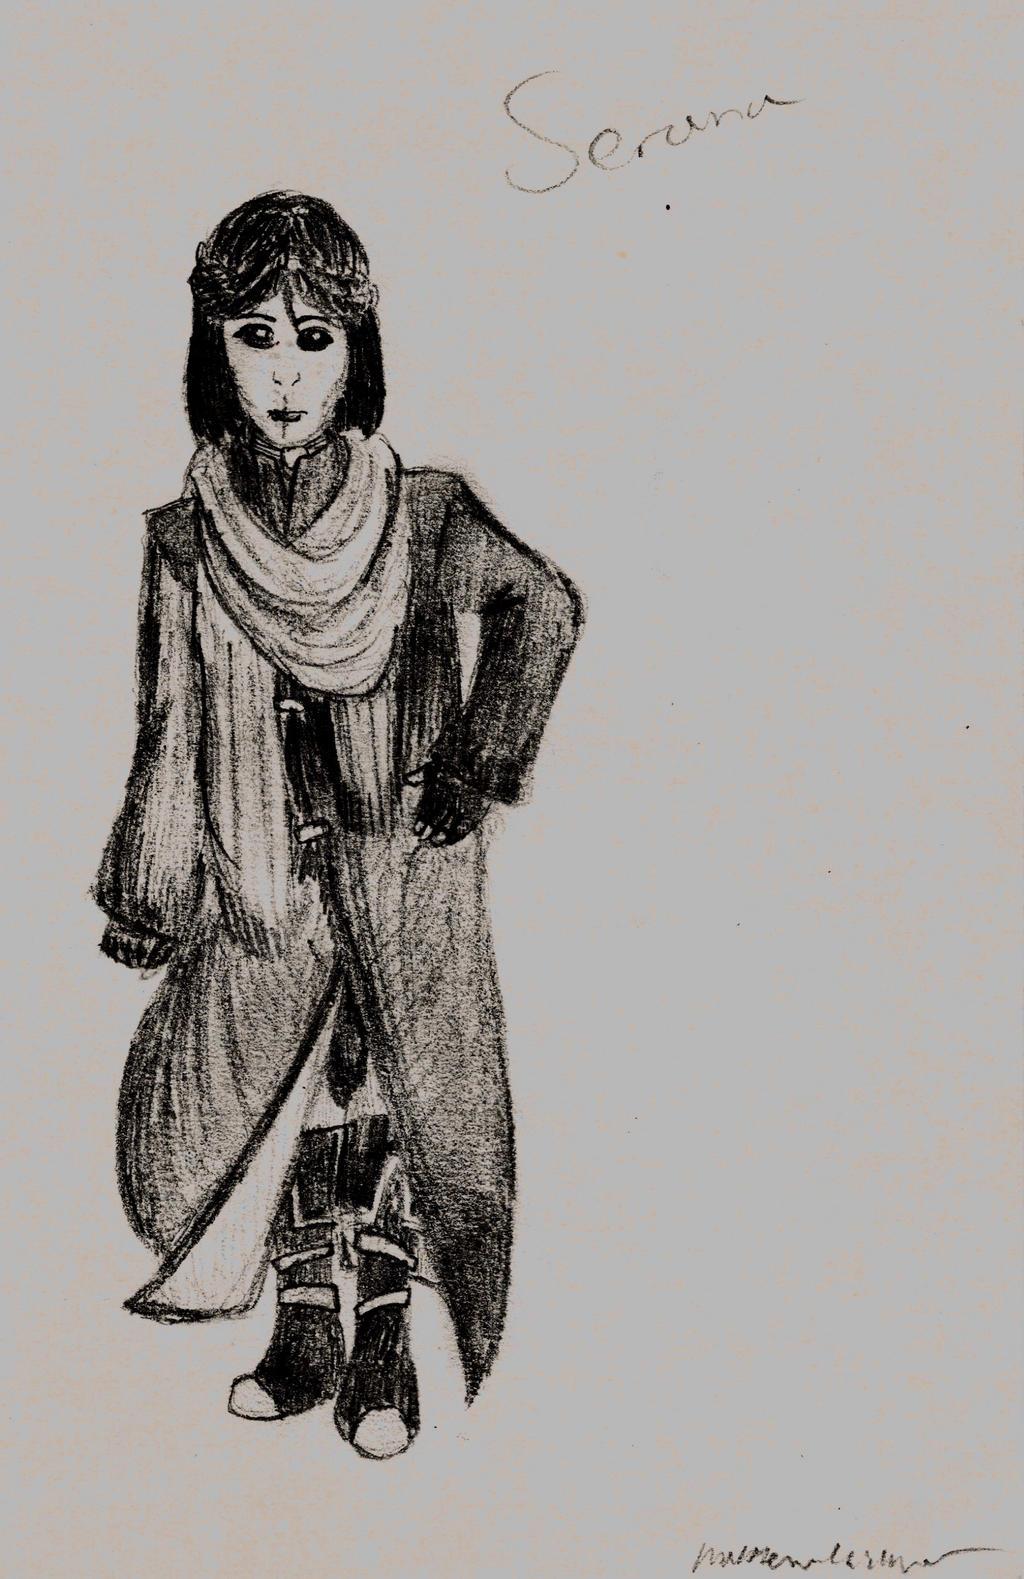 Serana in Desert Robes by holmesian1891